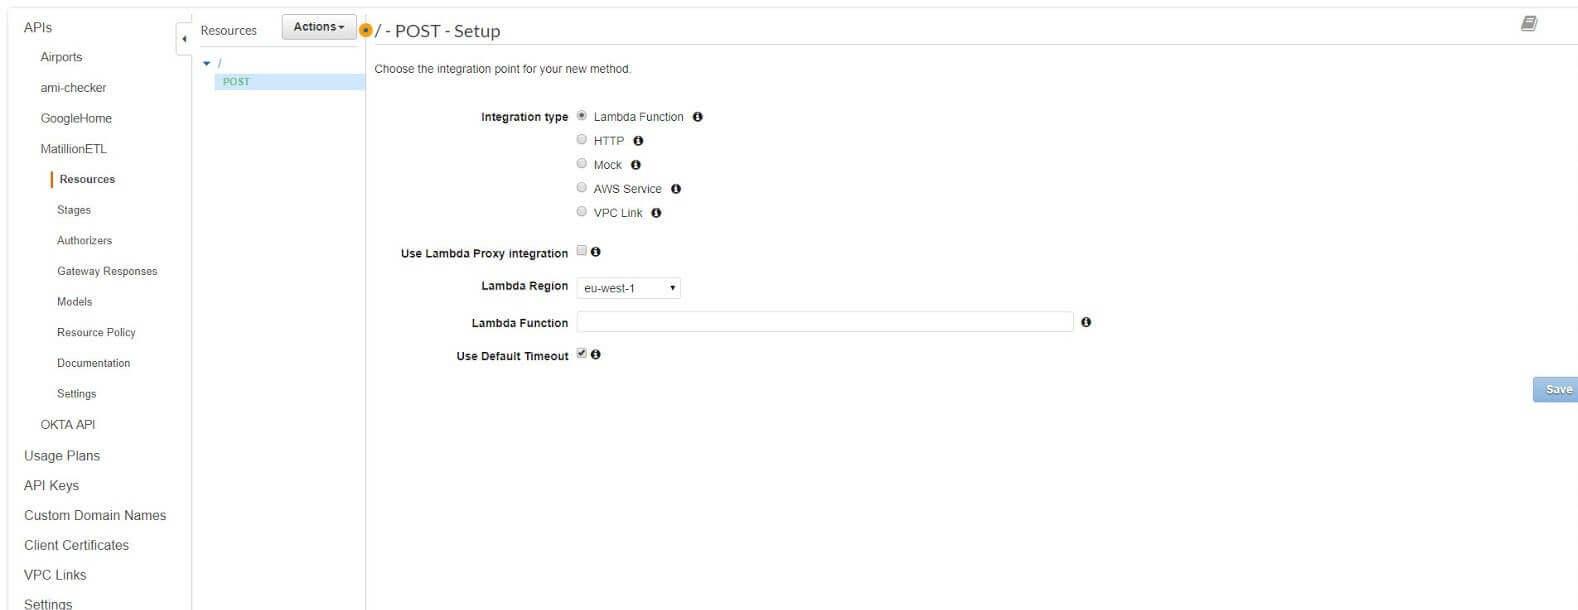 Matillion ETL Job from your Google Home device - API